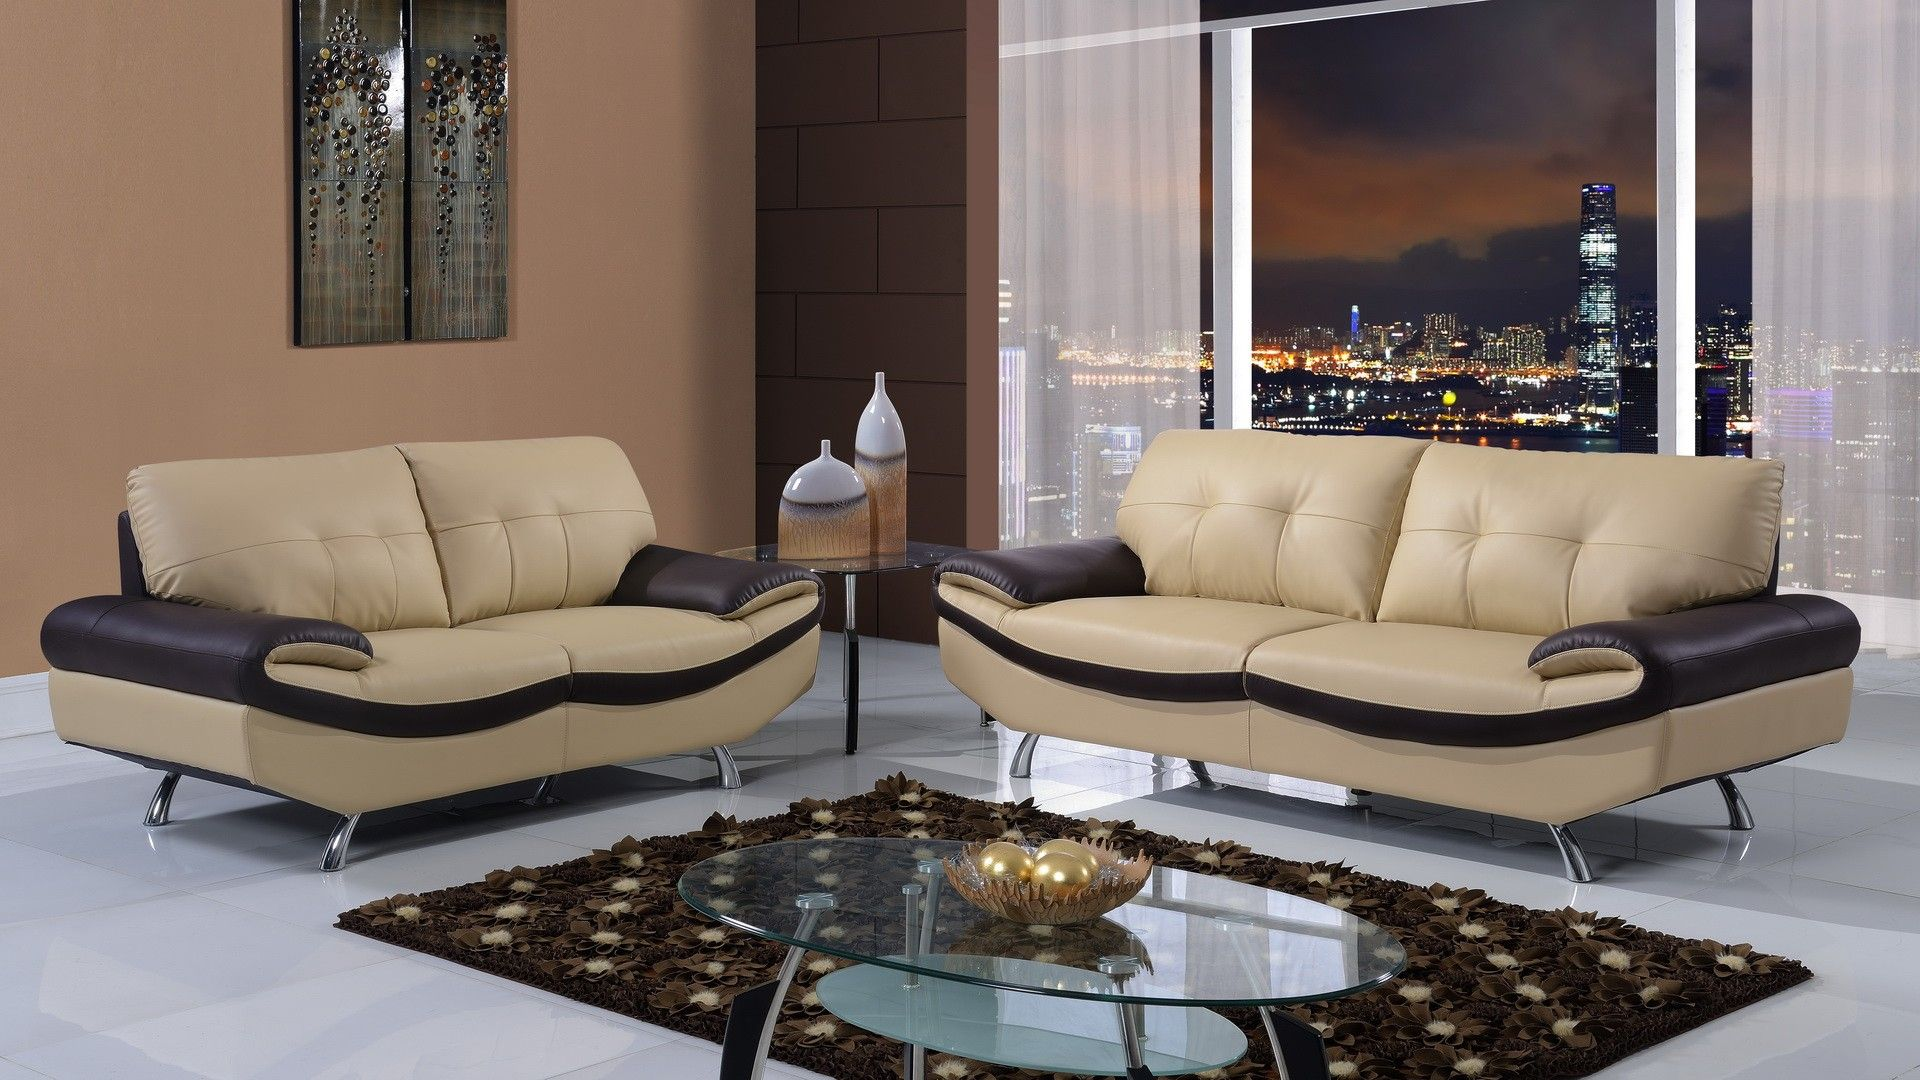 Global UFM123 CAPP CH Sofa Loveseat Chair Modern set in the living